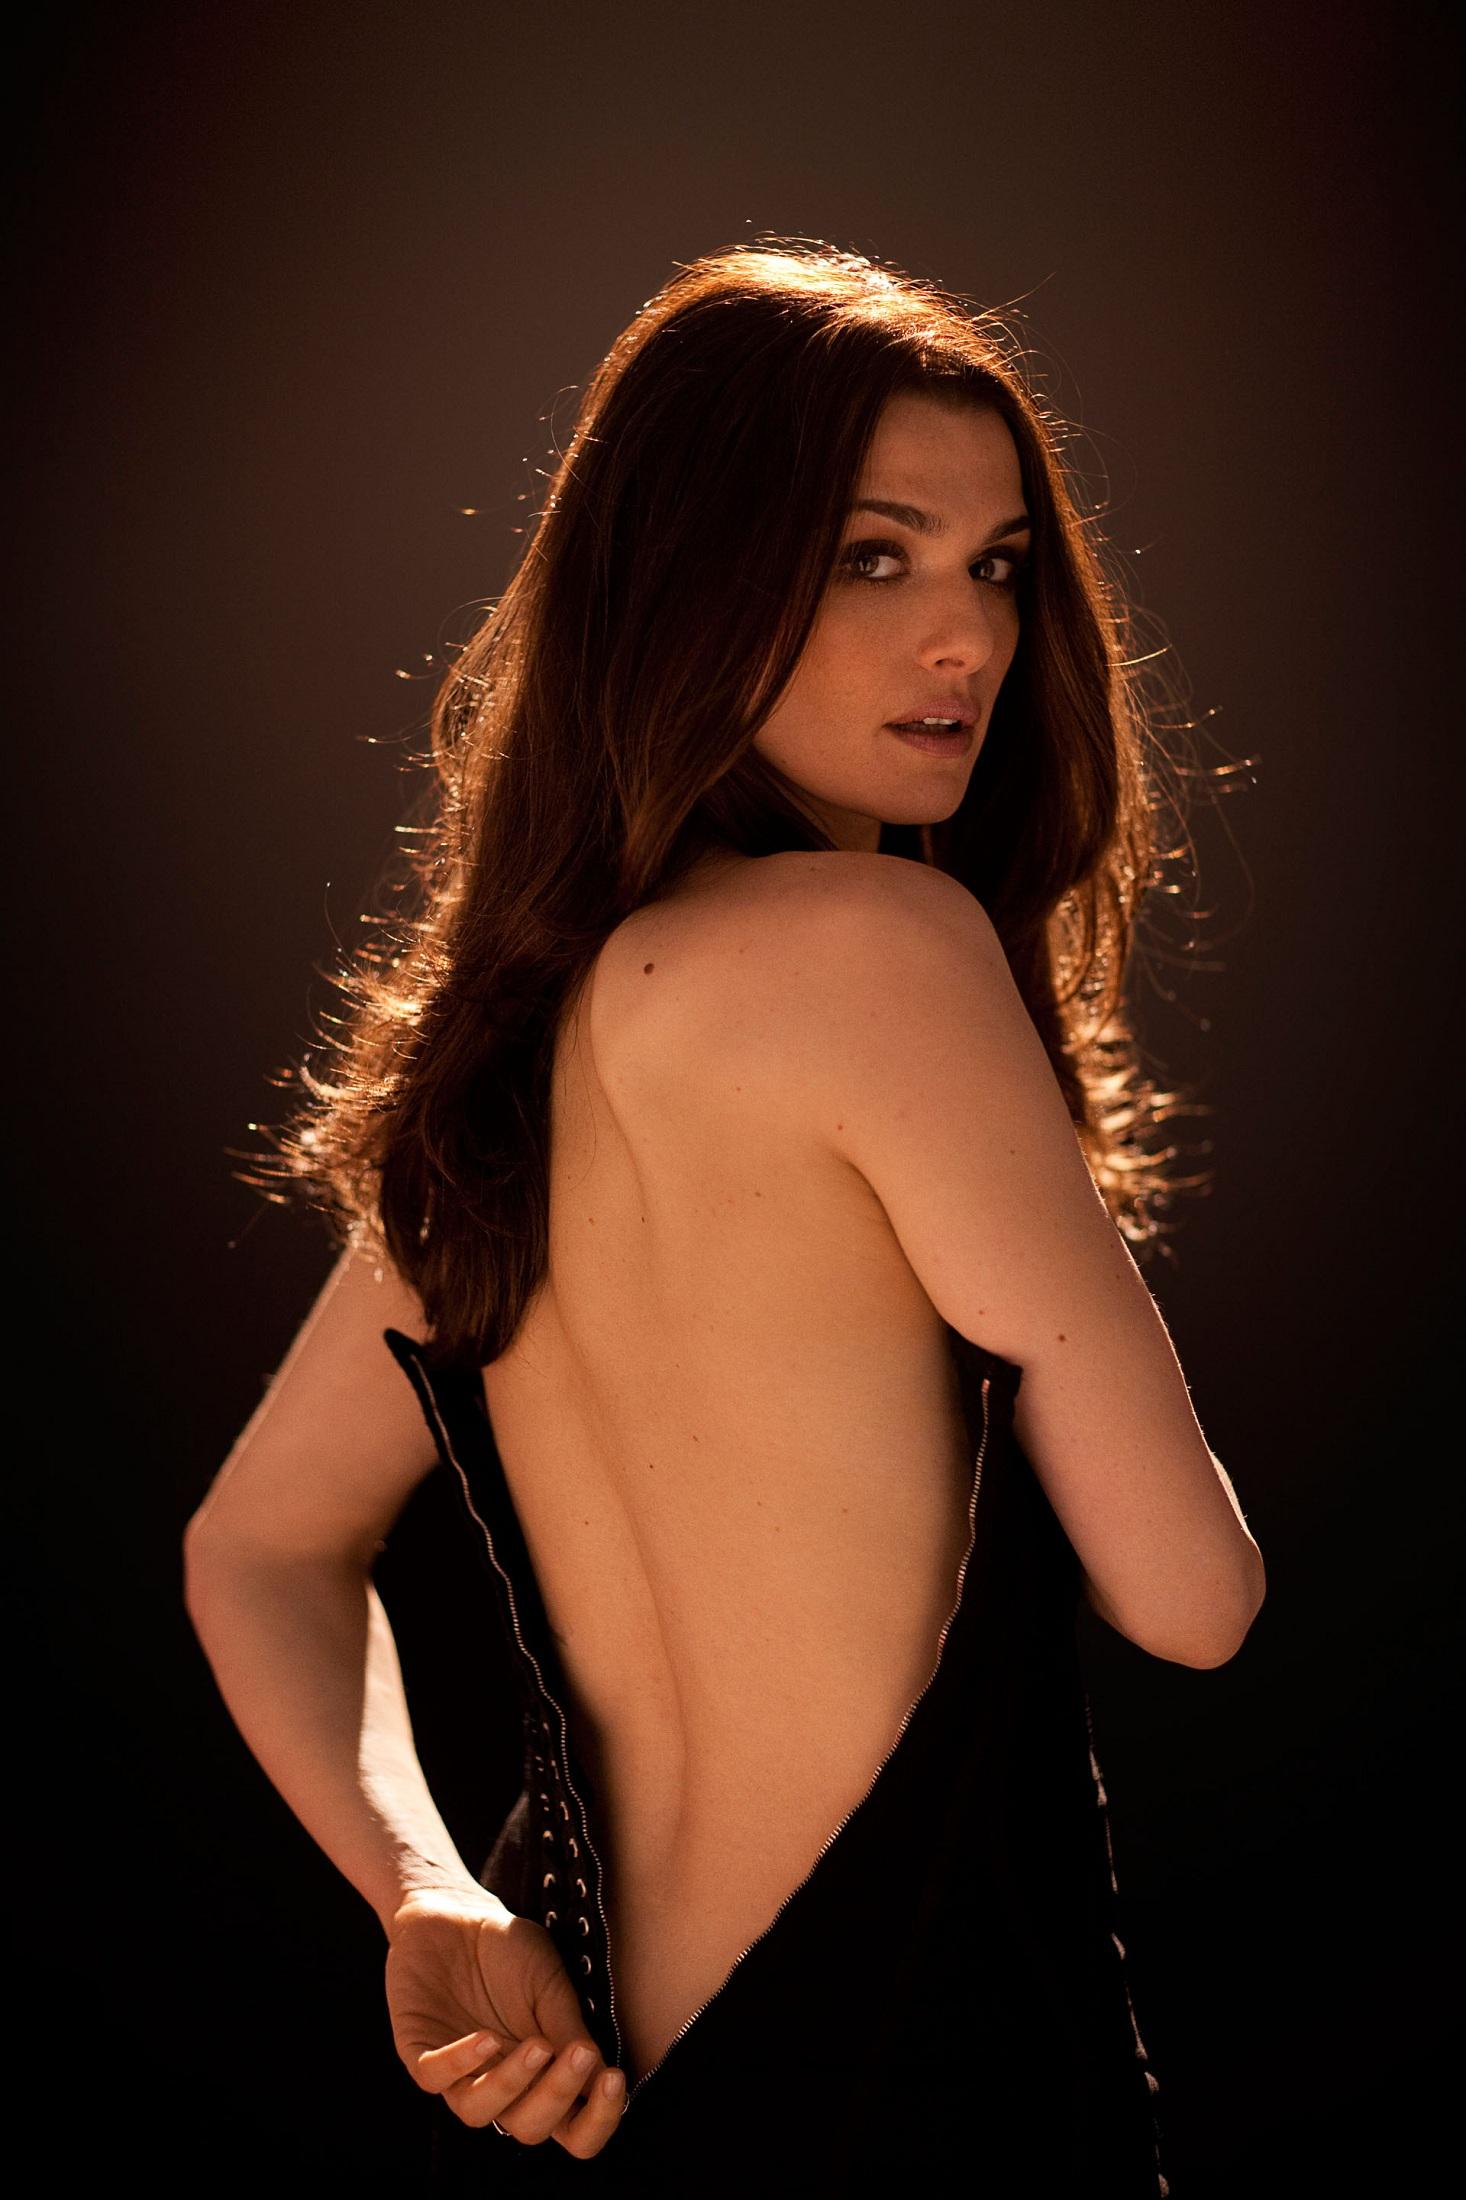 Rachel-Weisz-Hot-Backside-Pics-1.jpg